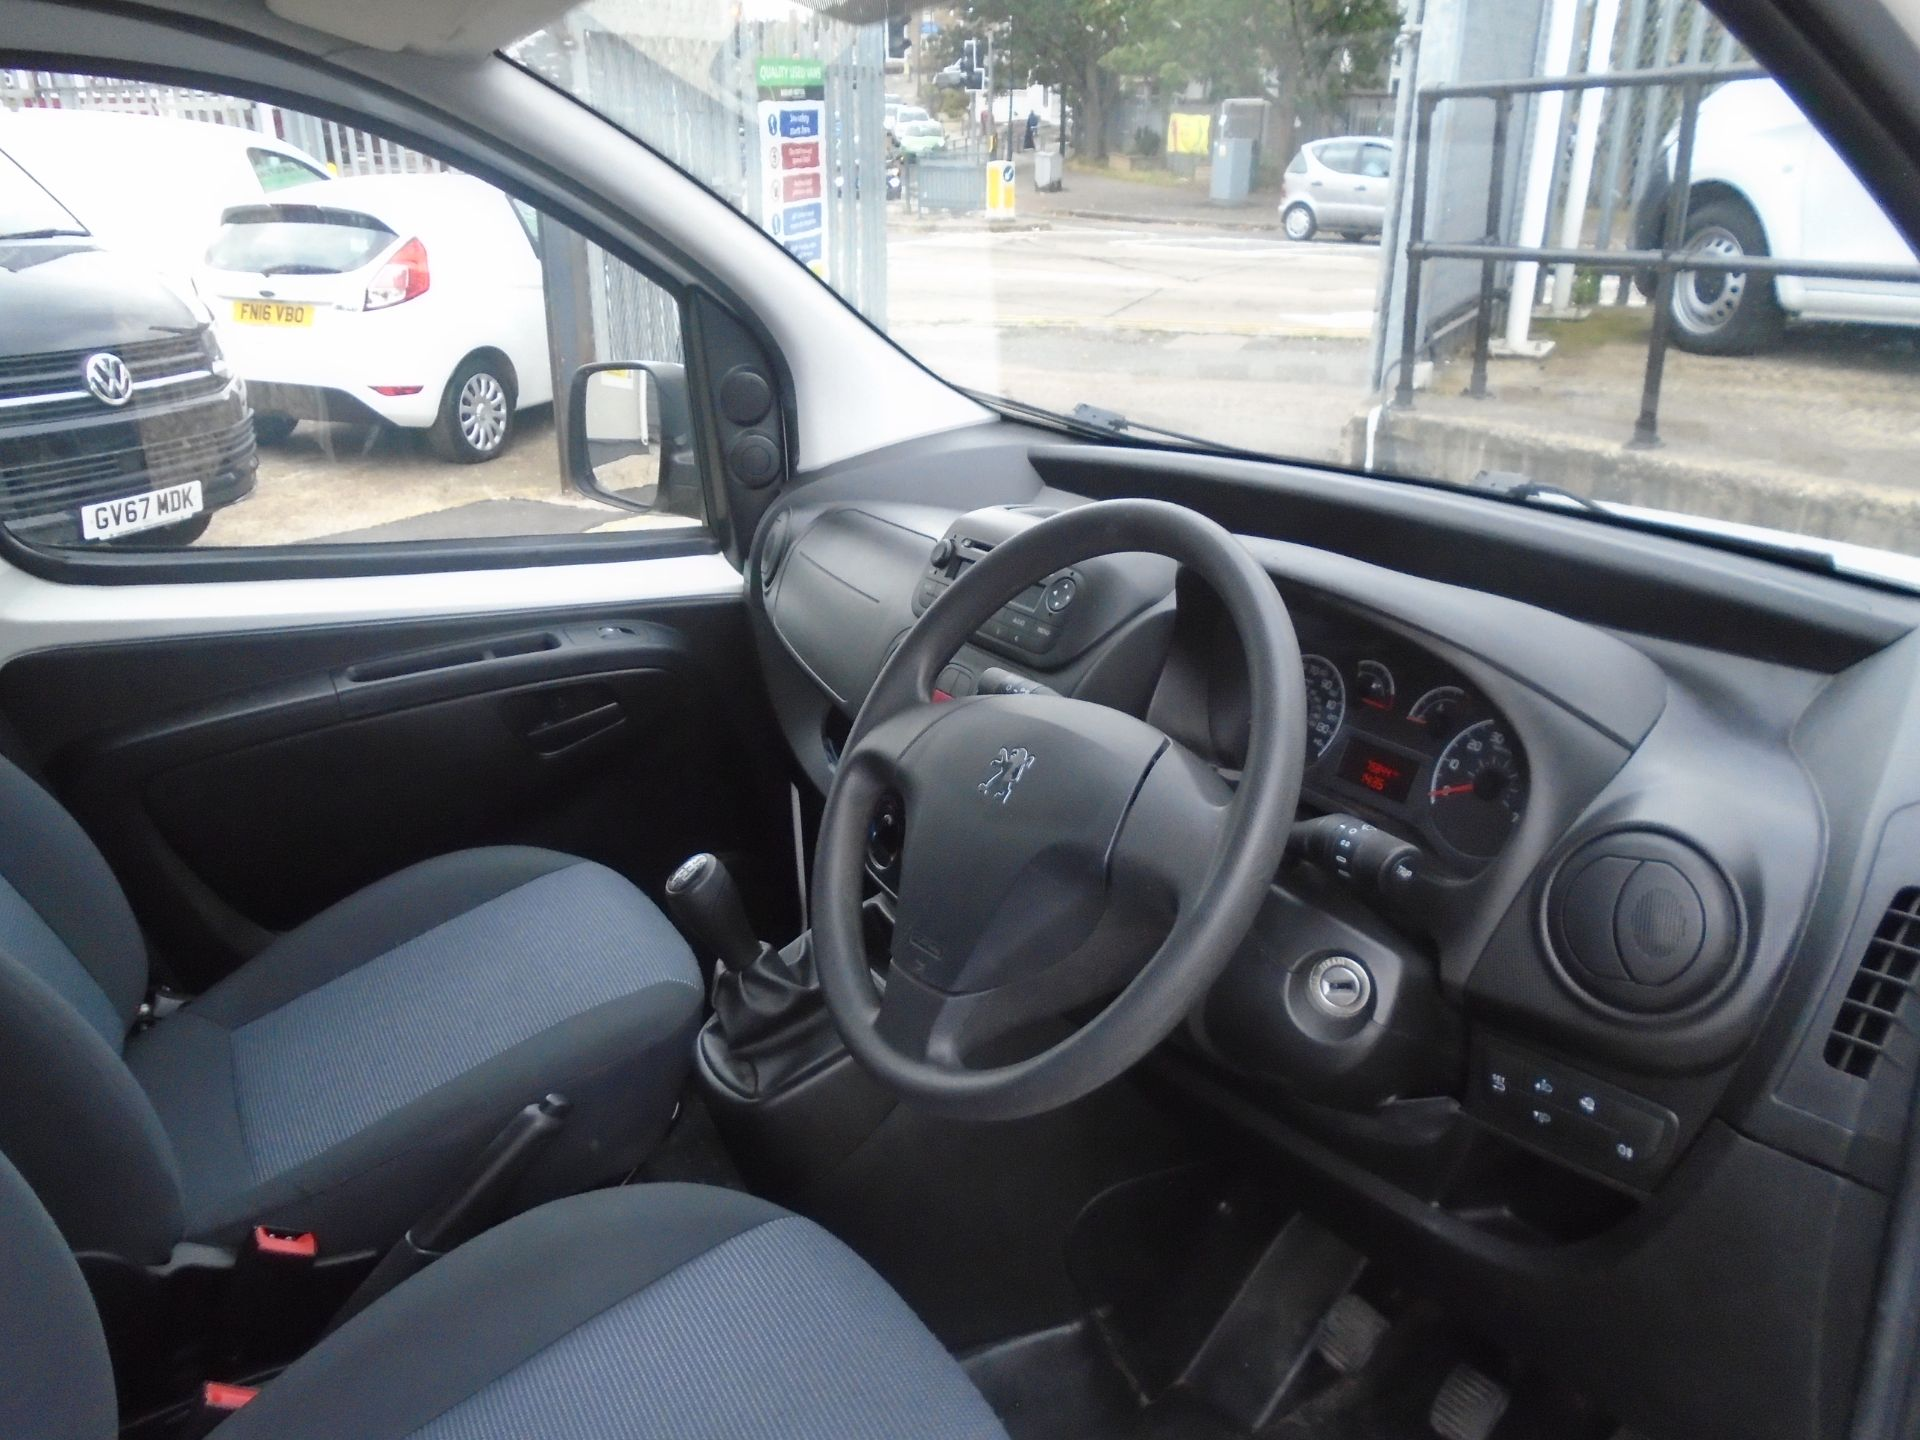 2015 Peugeot Bipper 1.3 Hdi 75 S Plus Pack [Sld] (NU65EBC) Image 15